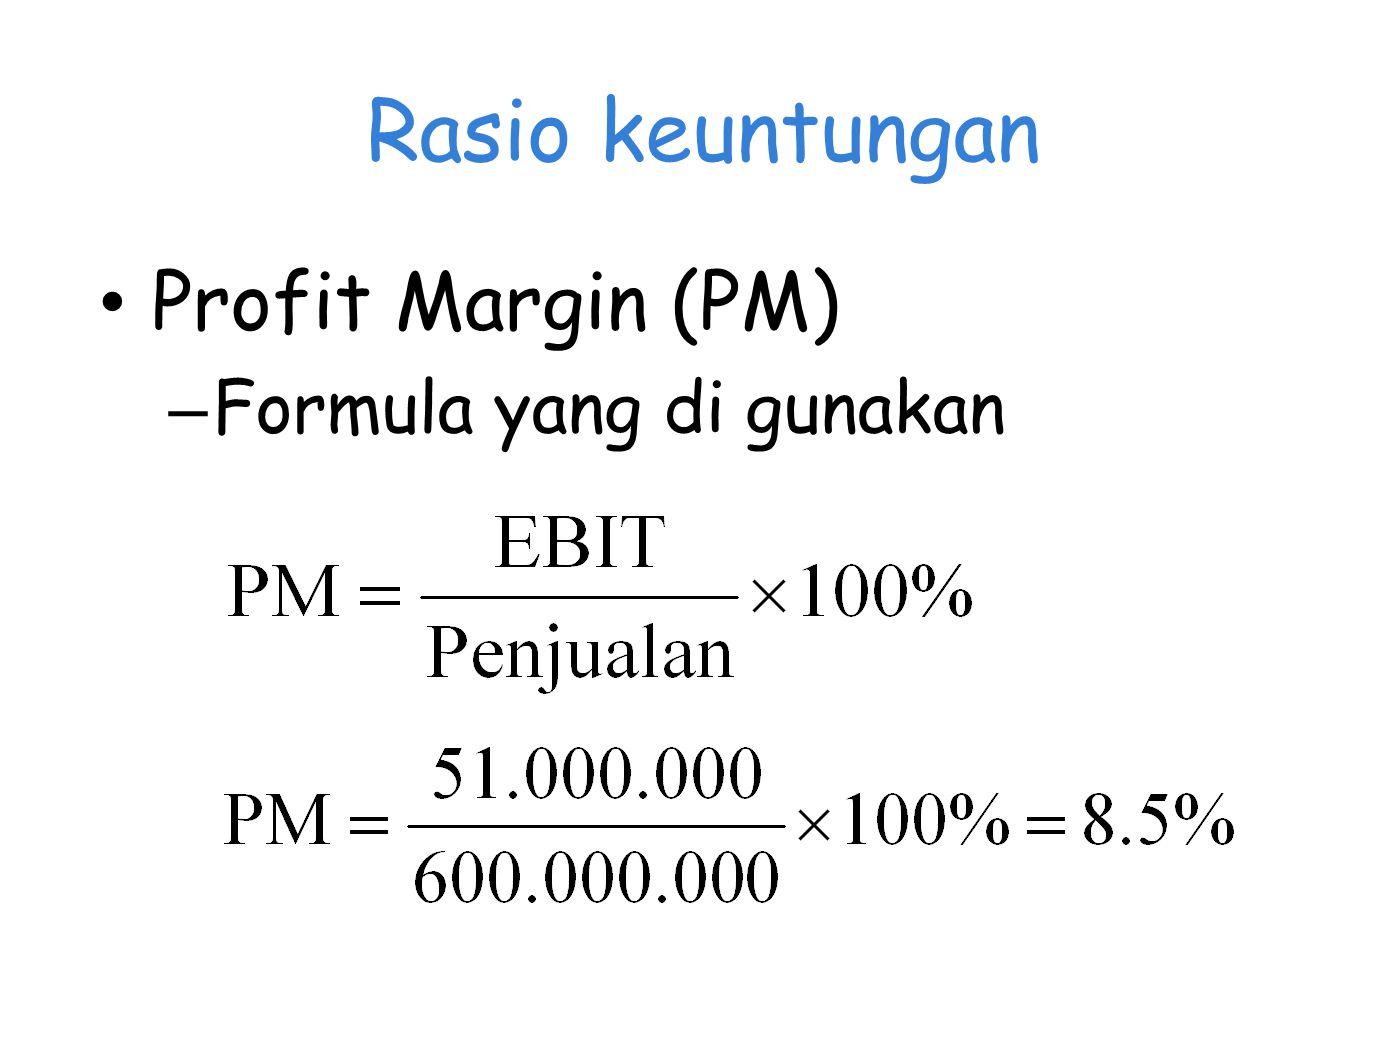 Rasio keuntungan Profit Margin (PM) Formula yang di gunakan